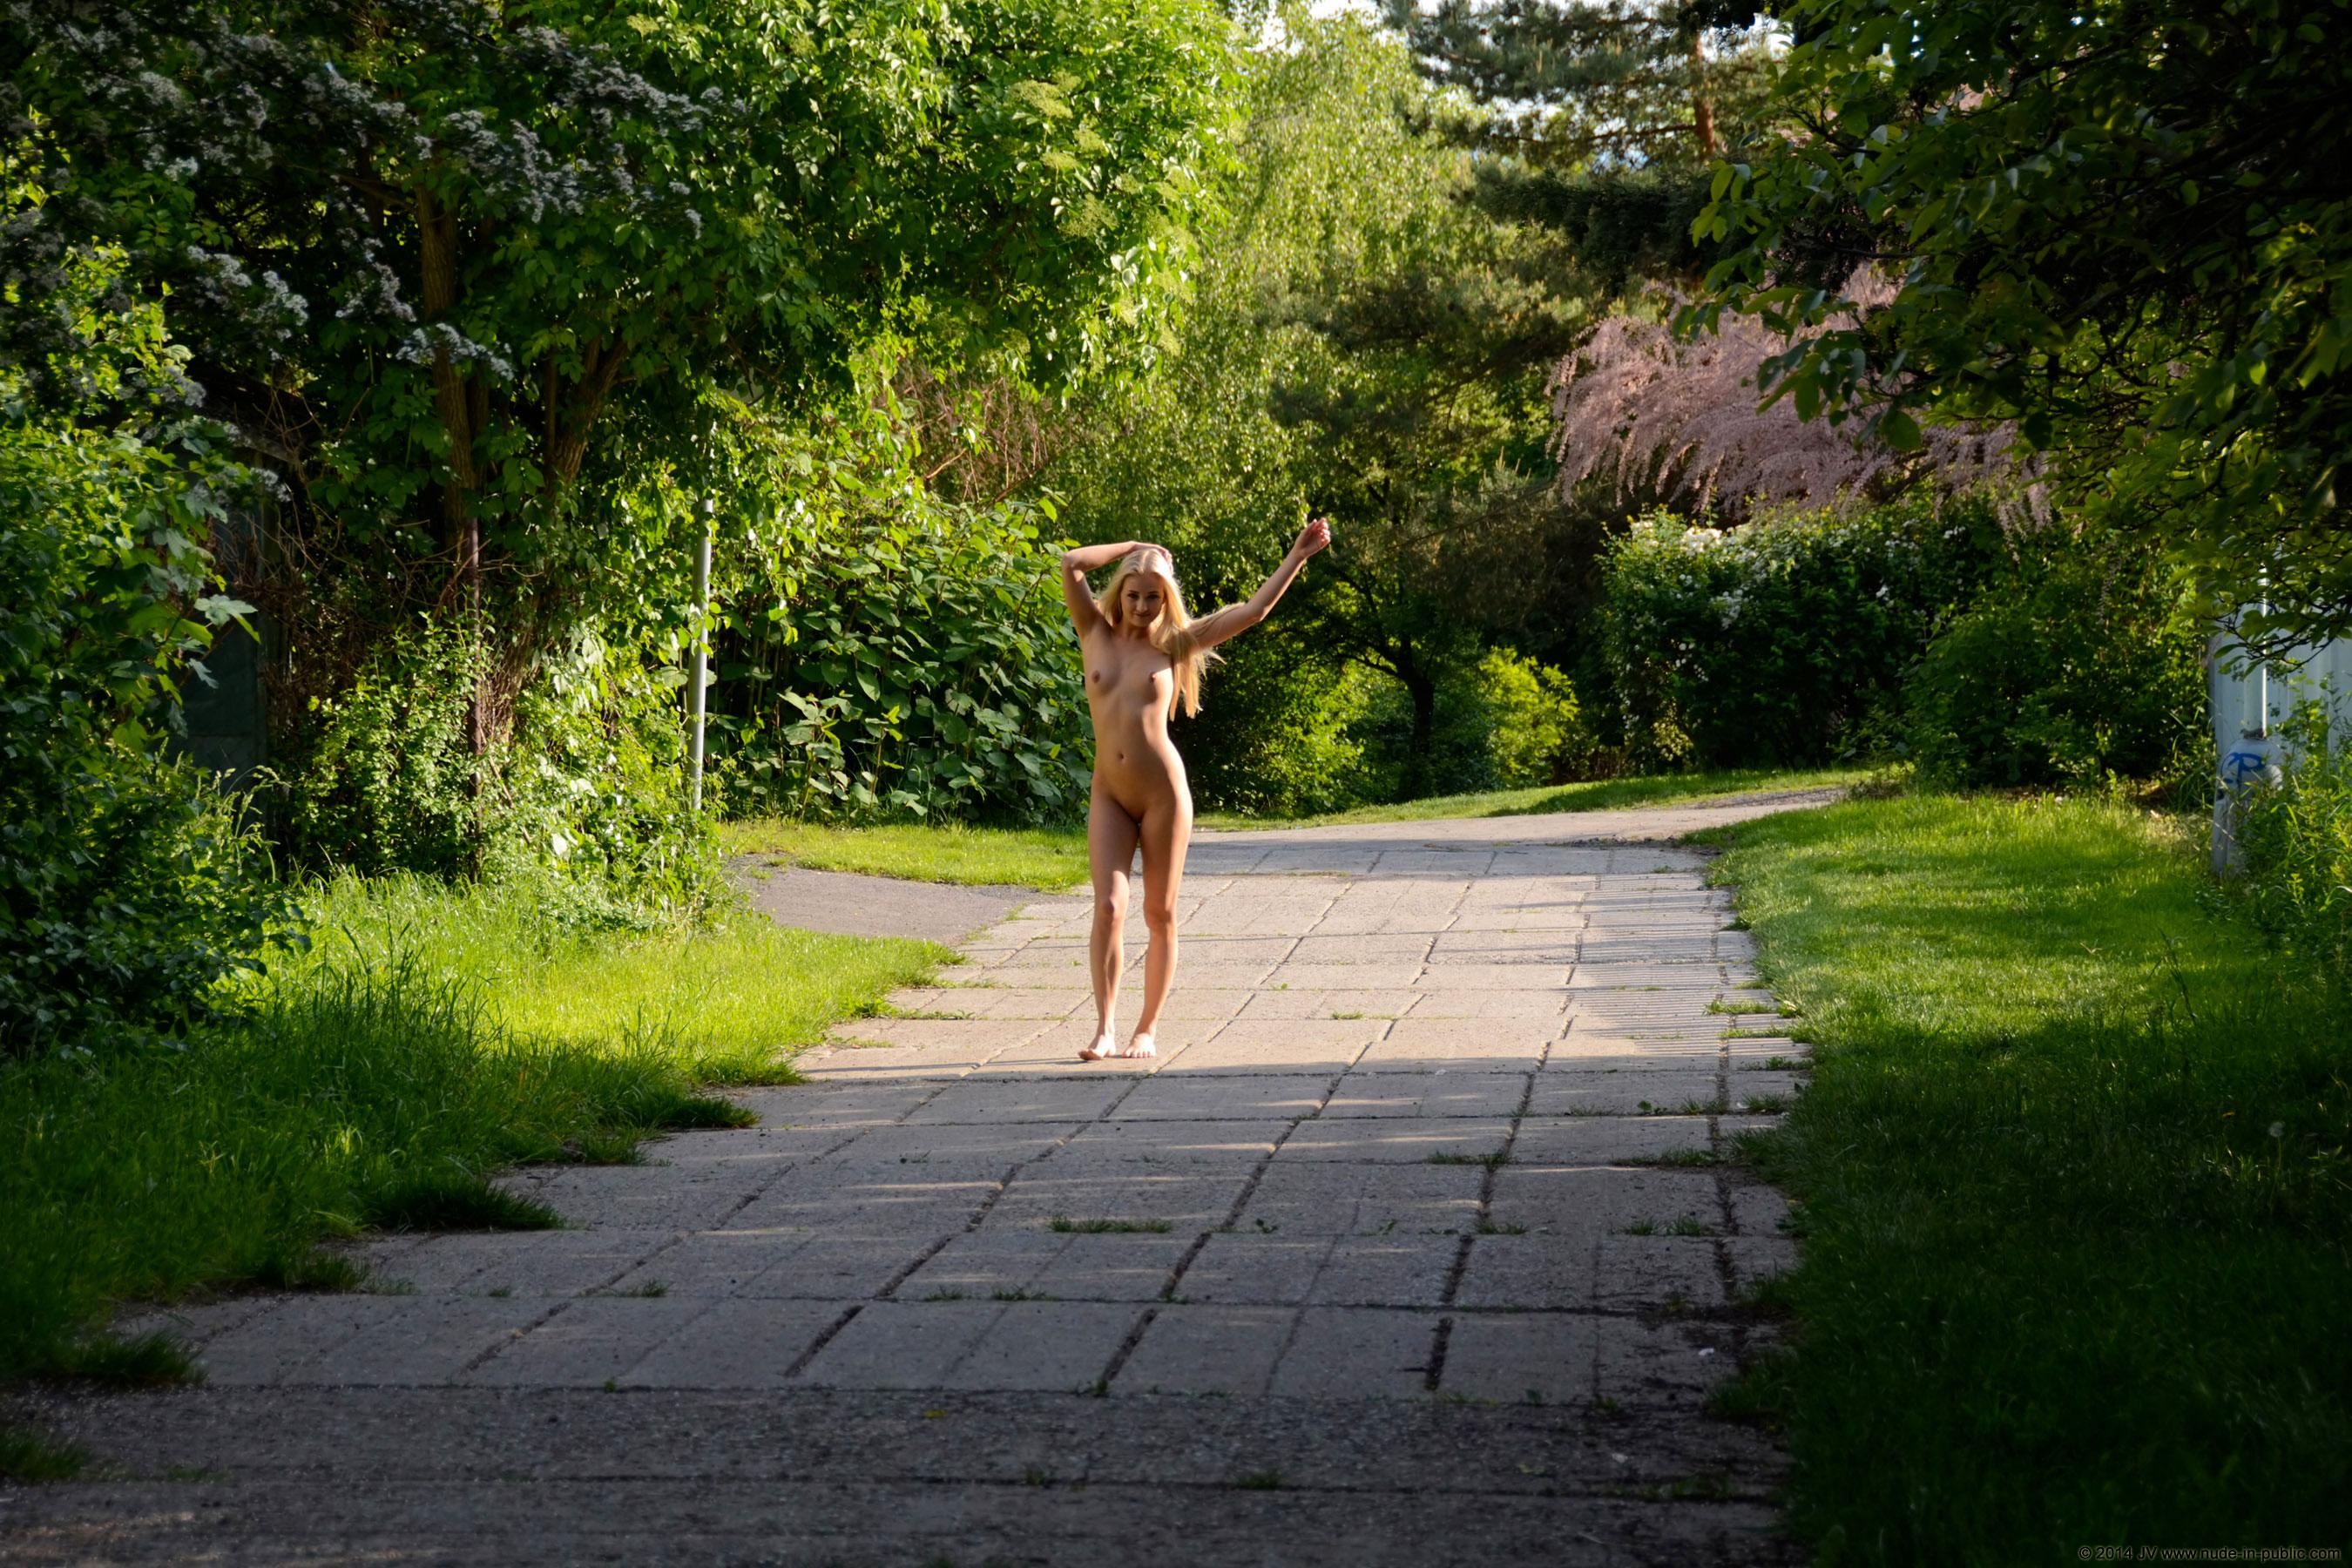 karolina-m-blonde-on-the-street-nude-in-public-17